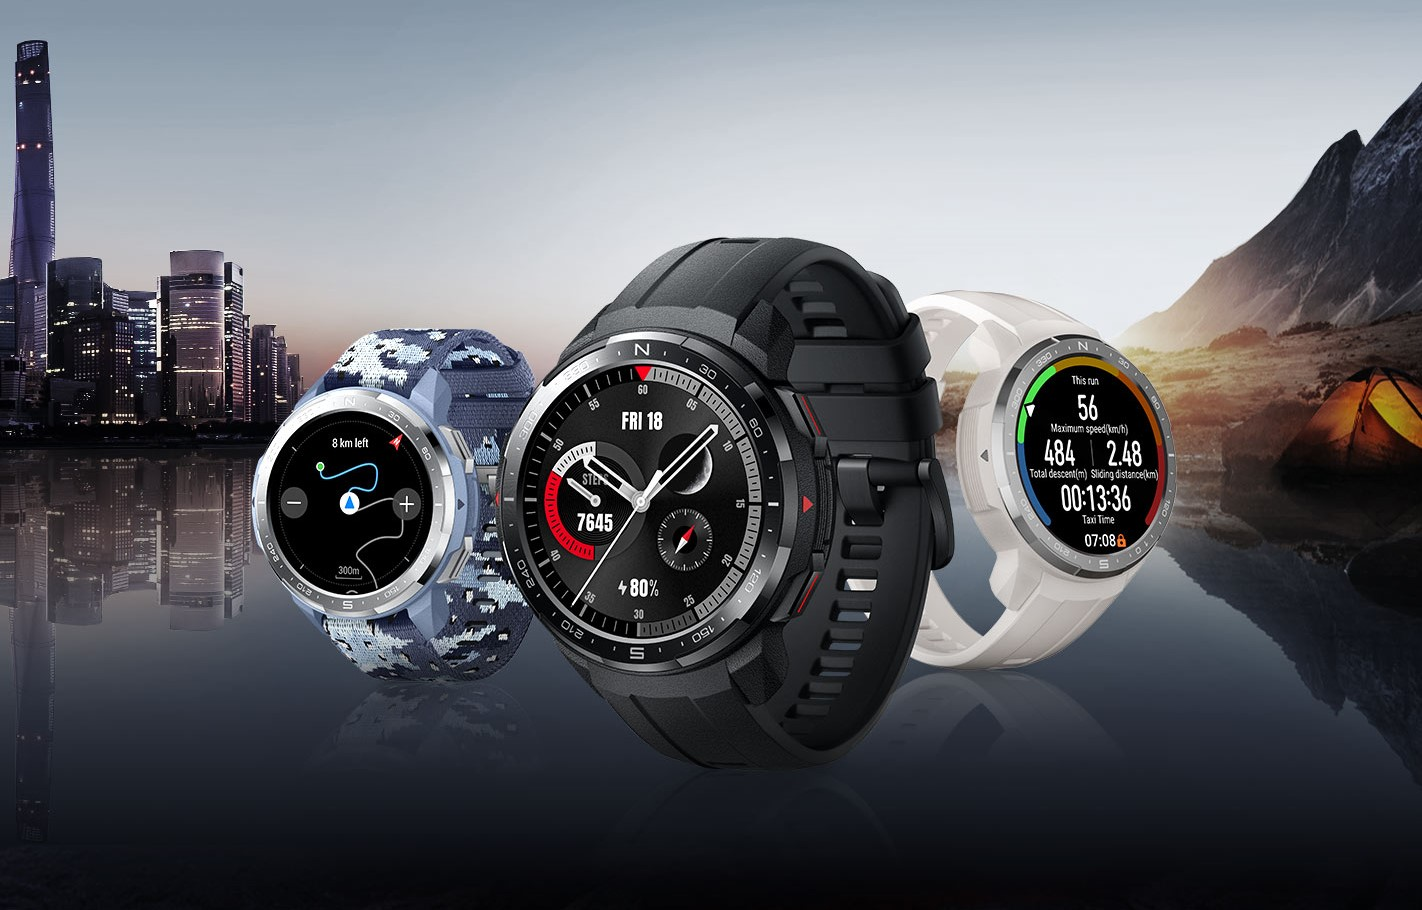 Варианты цветов Honor Watch GS Pro